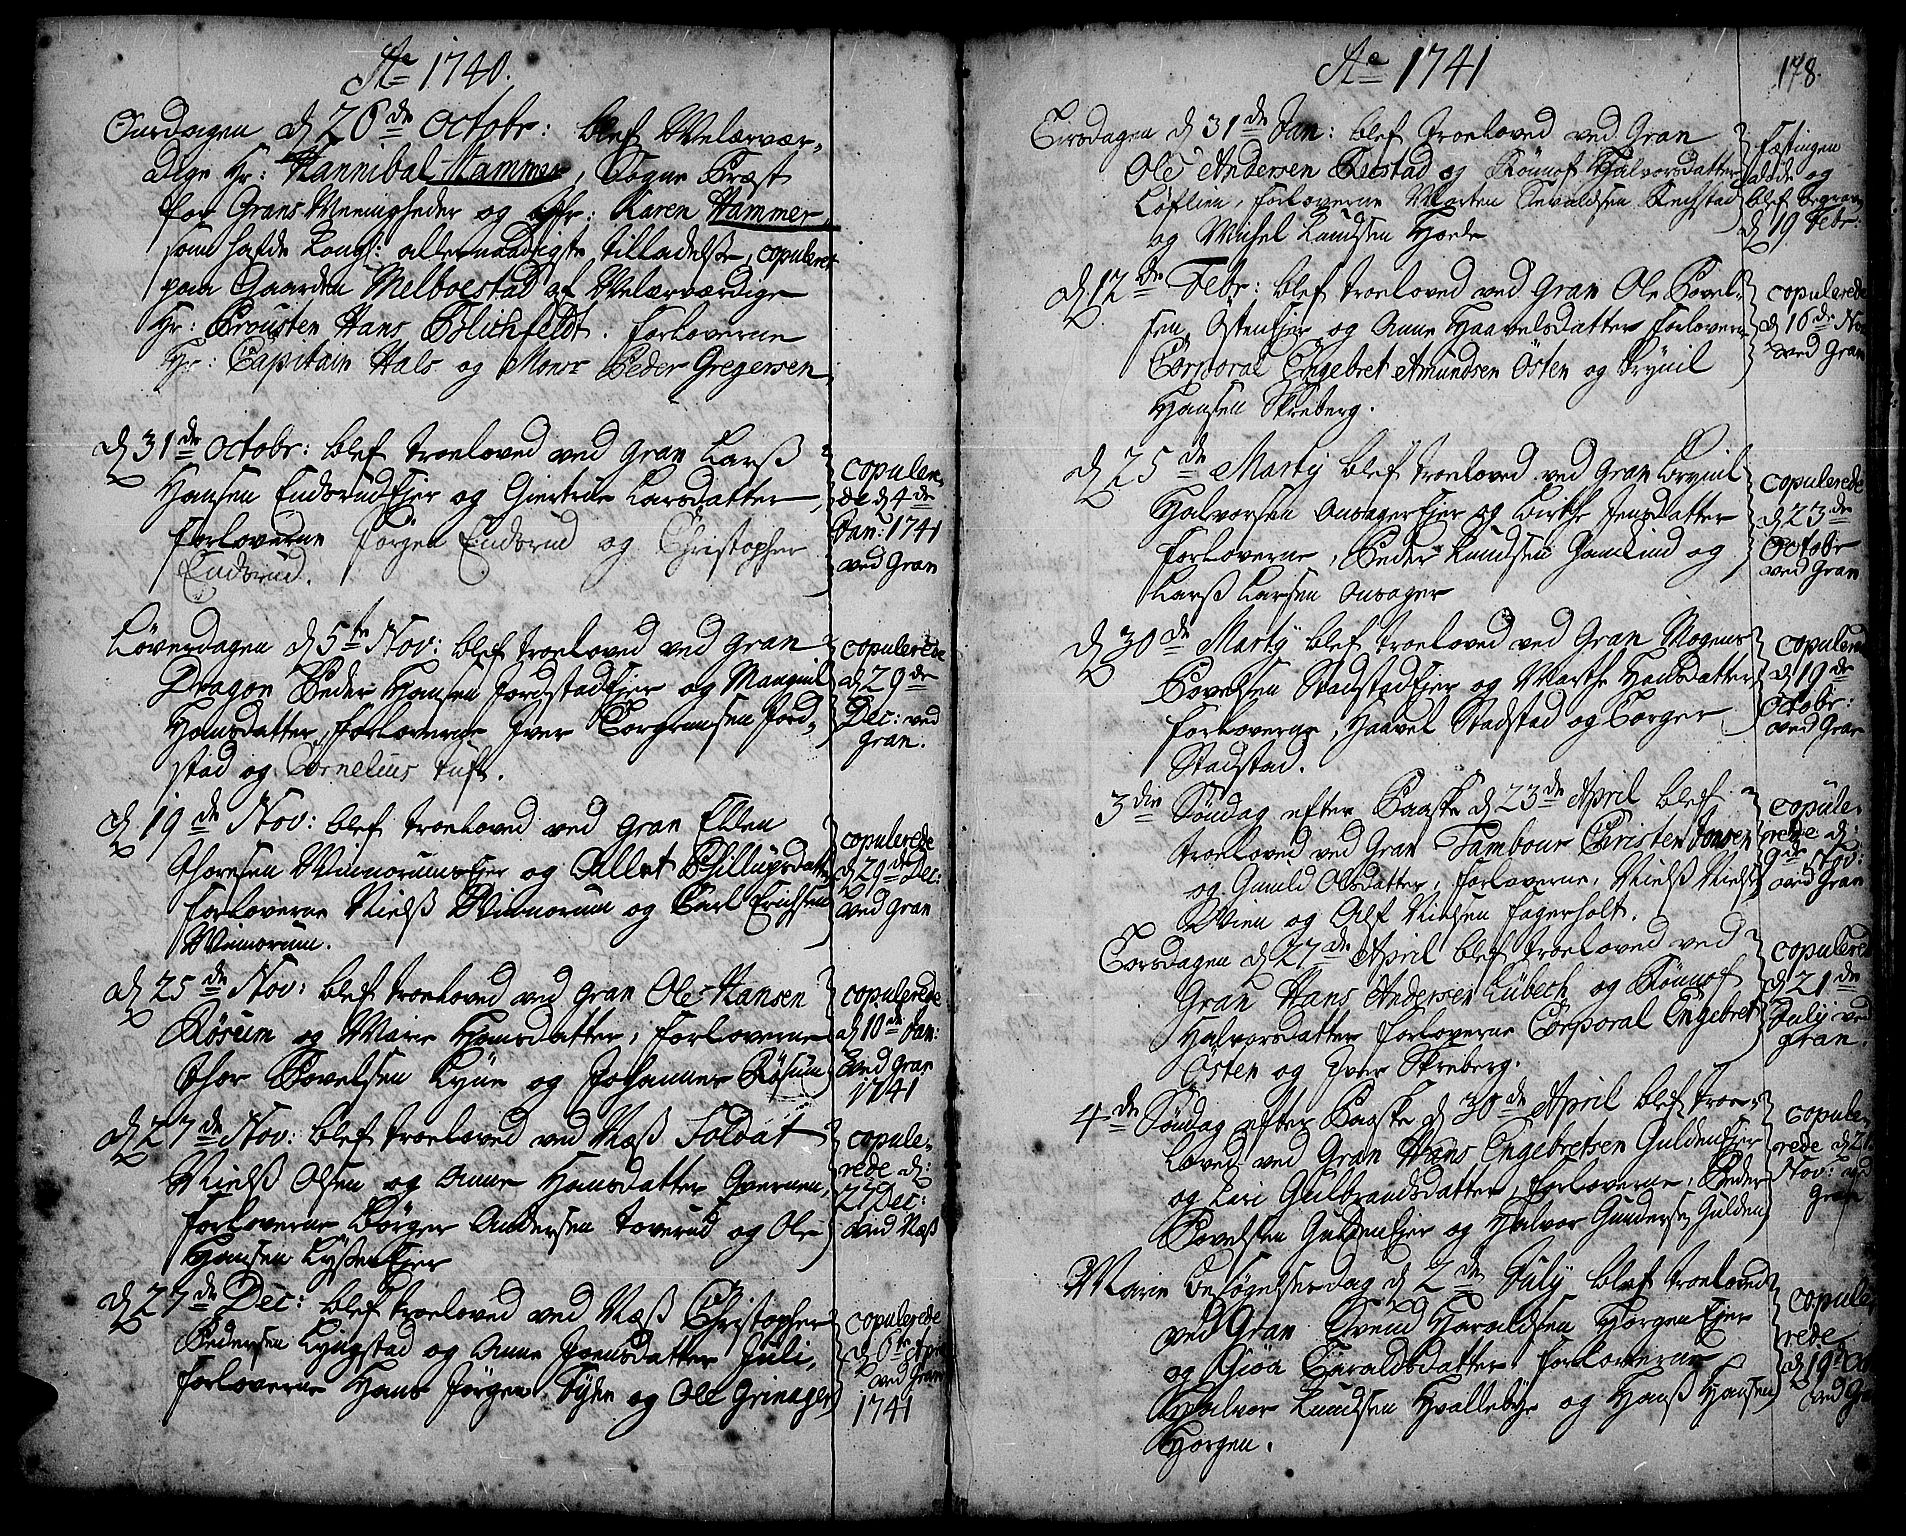 SAH, Gran prestekontor, Ministerialbok nr. 2, 1732-1744, s. 178